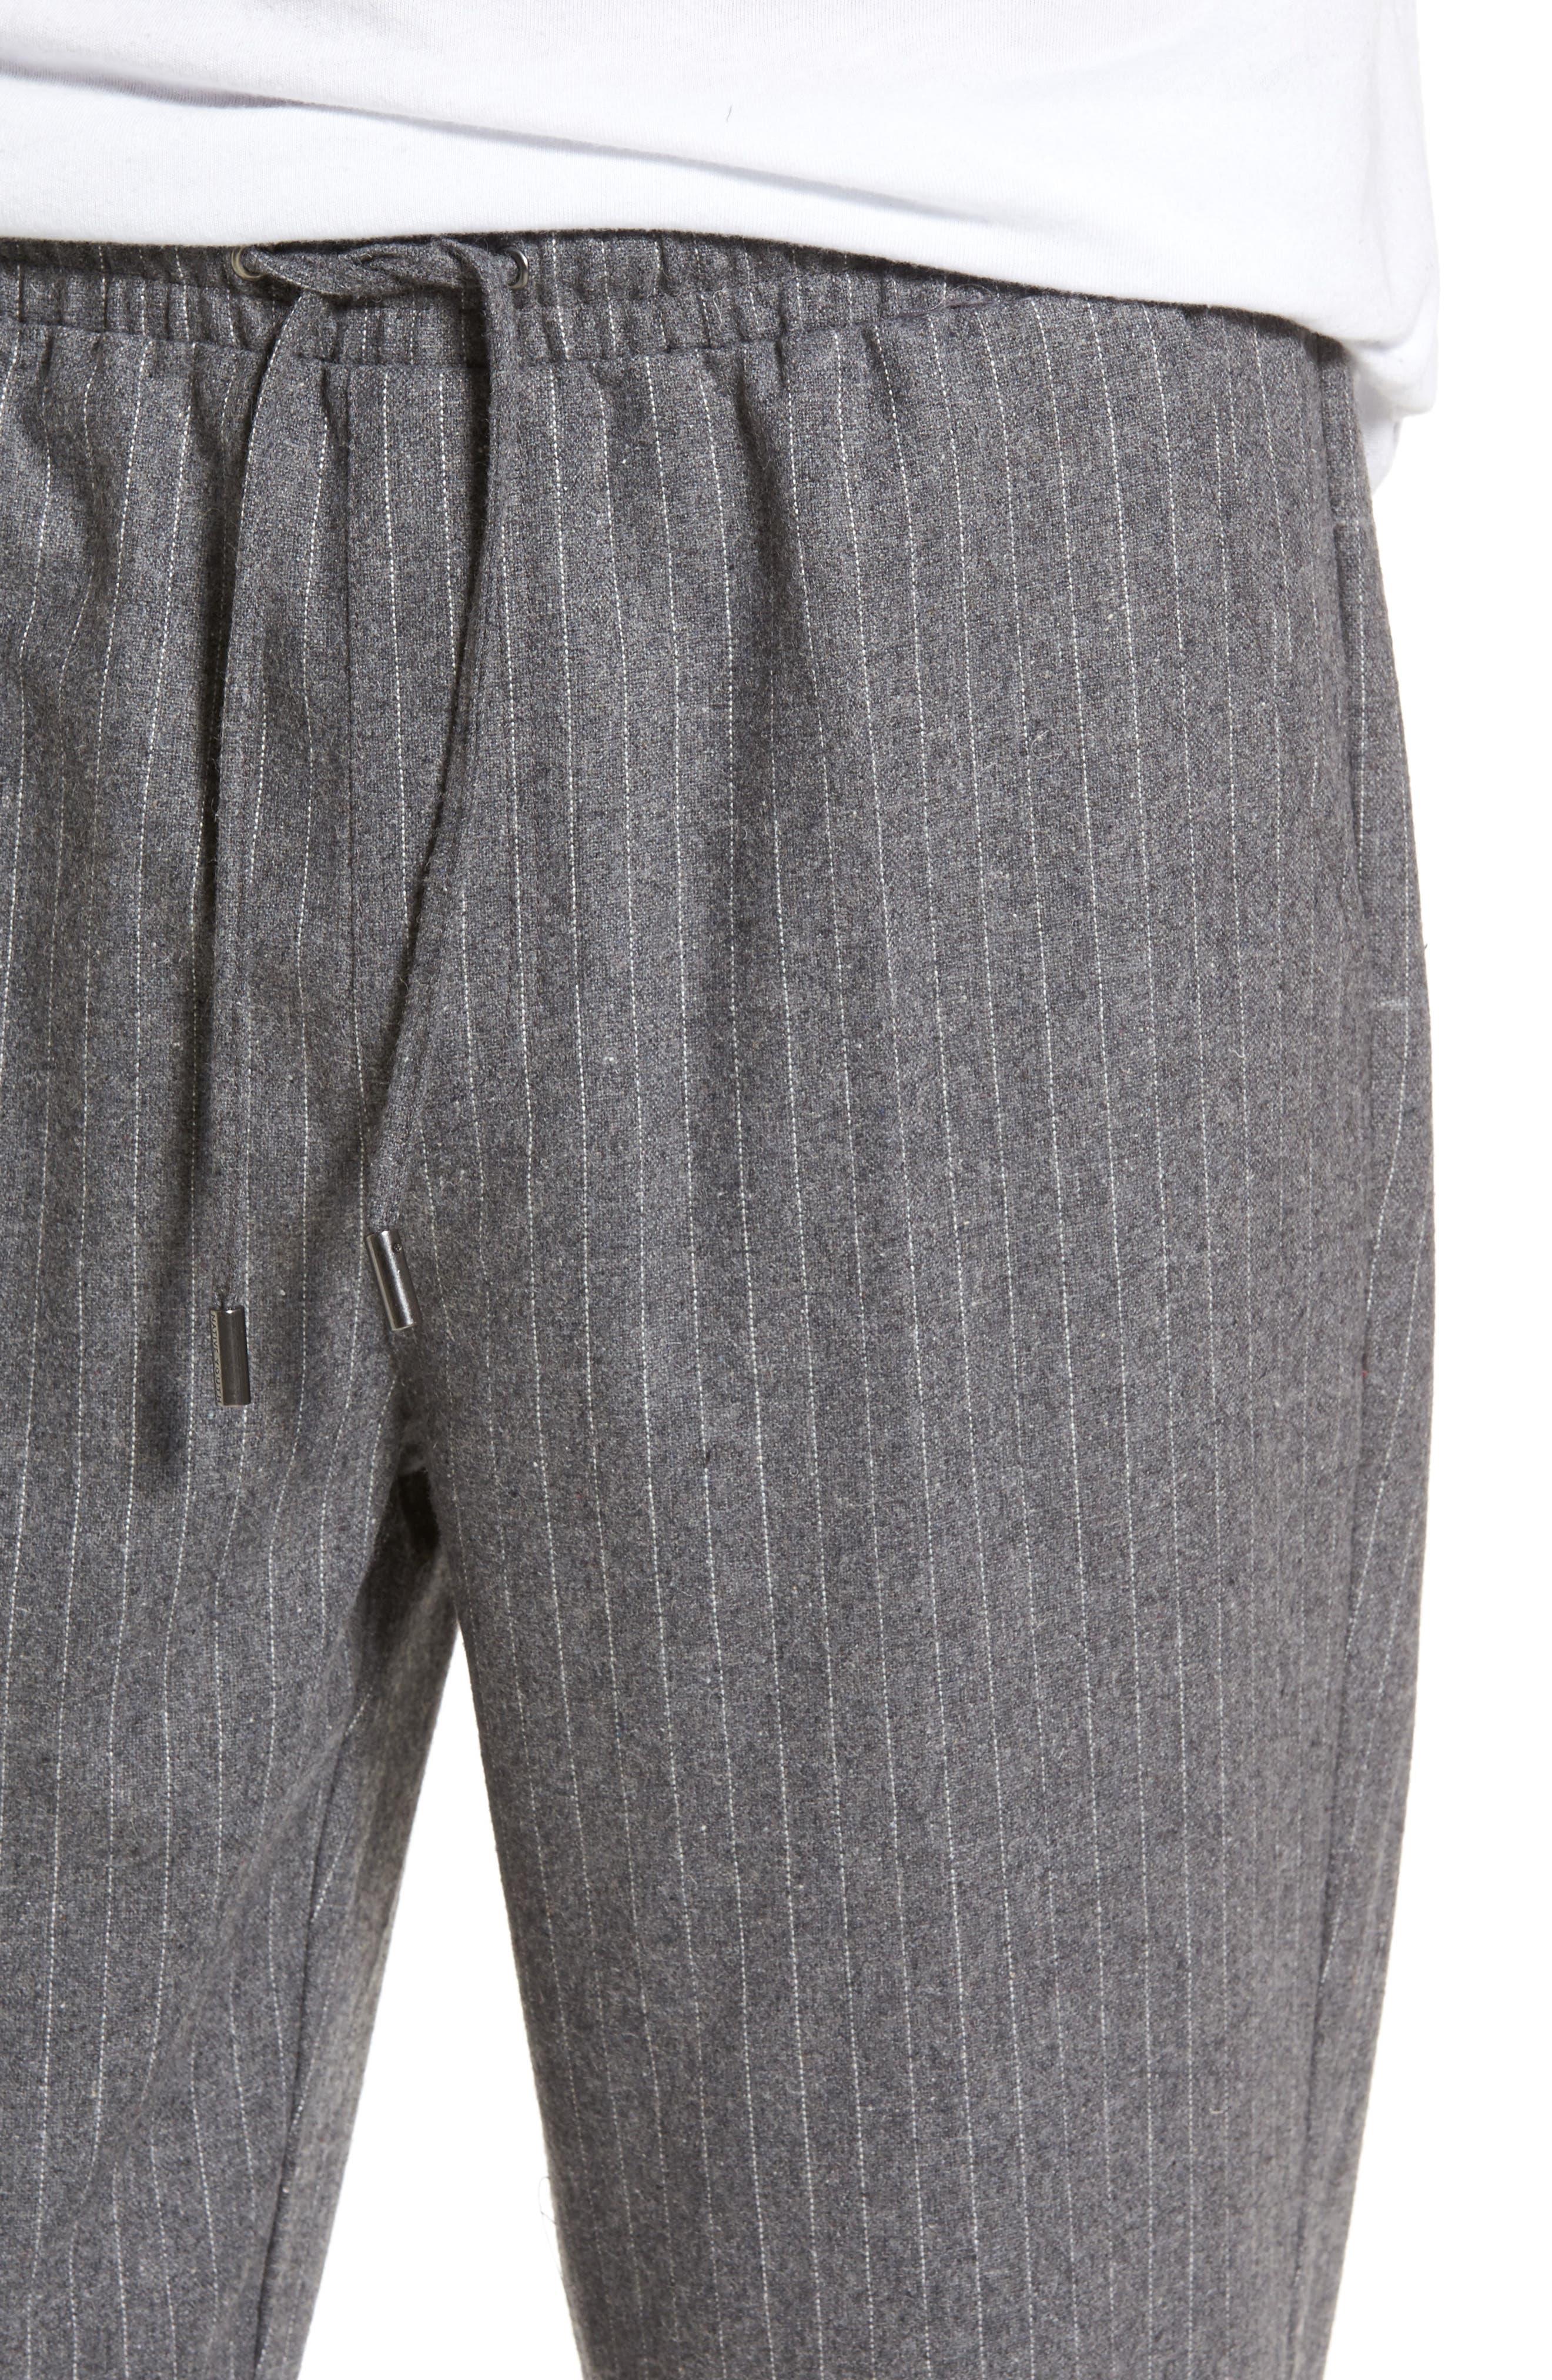 Pennyworth Pants,                             Alternate thumbnail 4, color,                             020